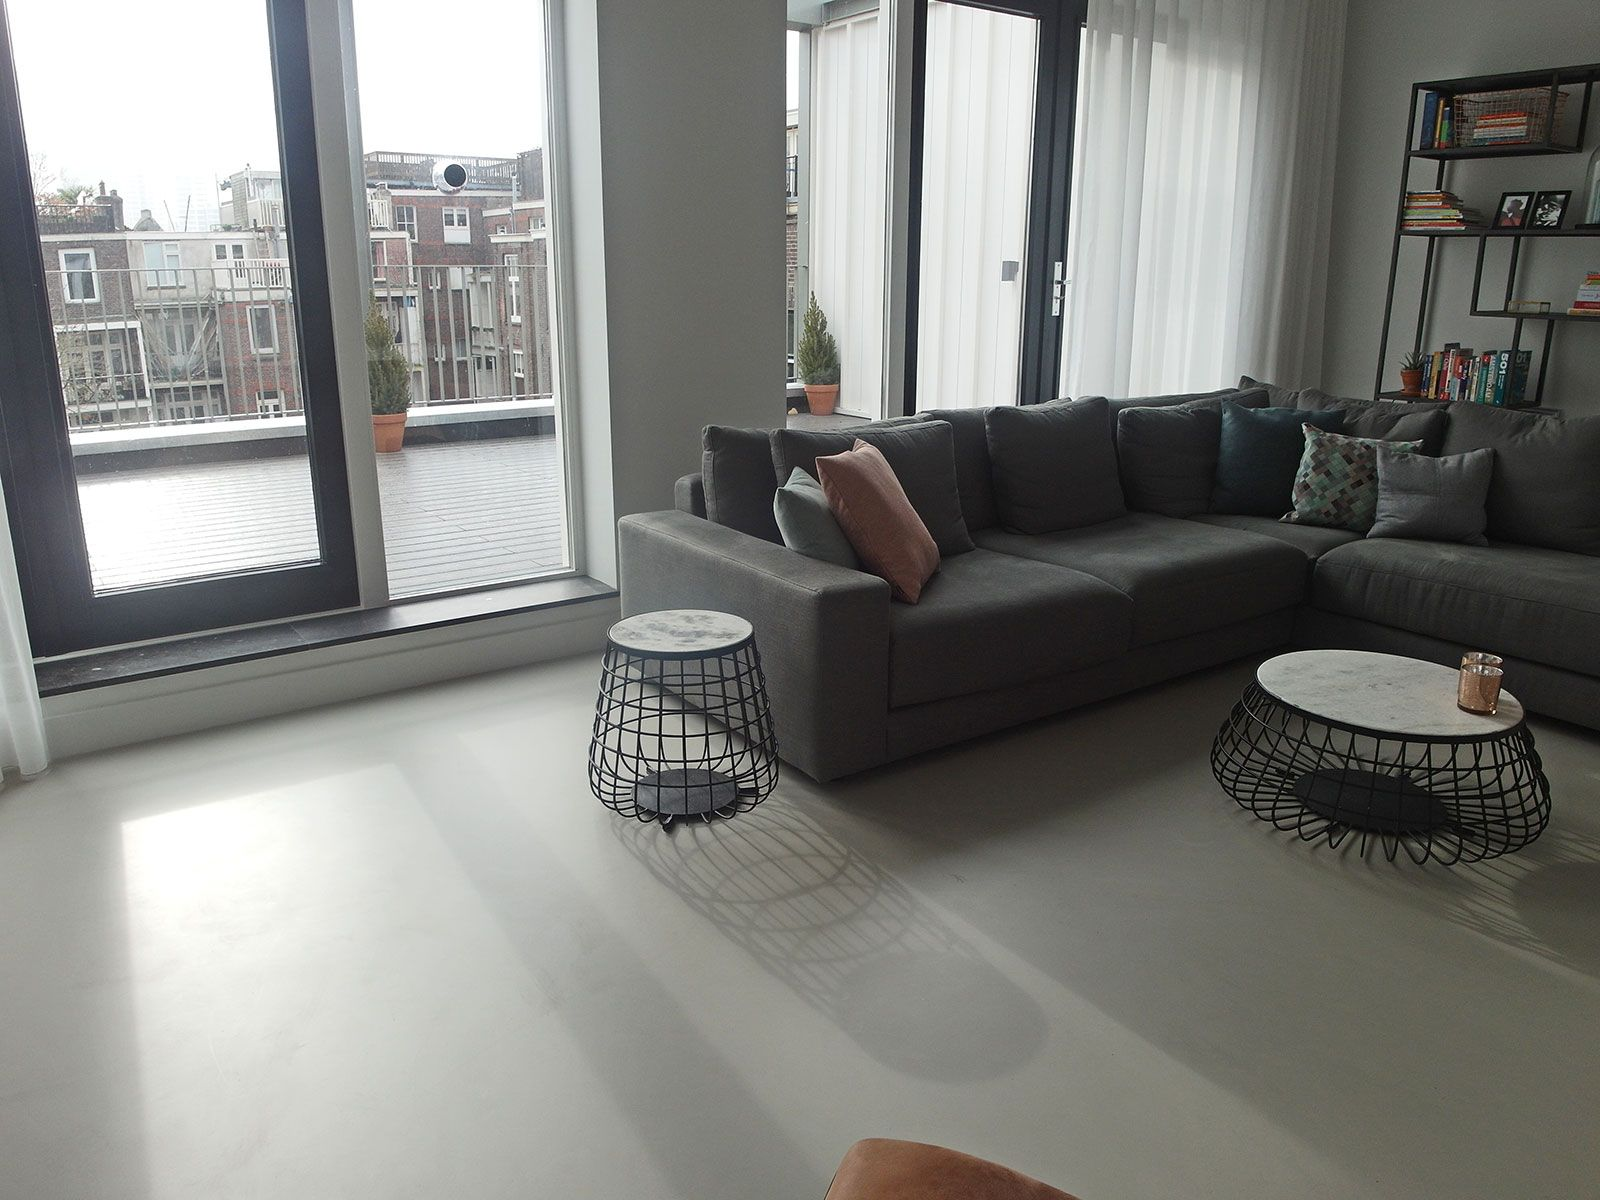 Gietvloer woonkamer Amsterdam | Huis - vloeren | Pinterest | Decoration